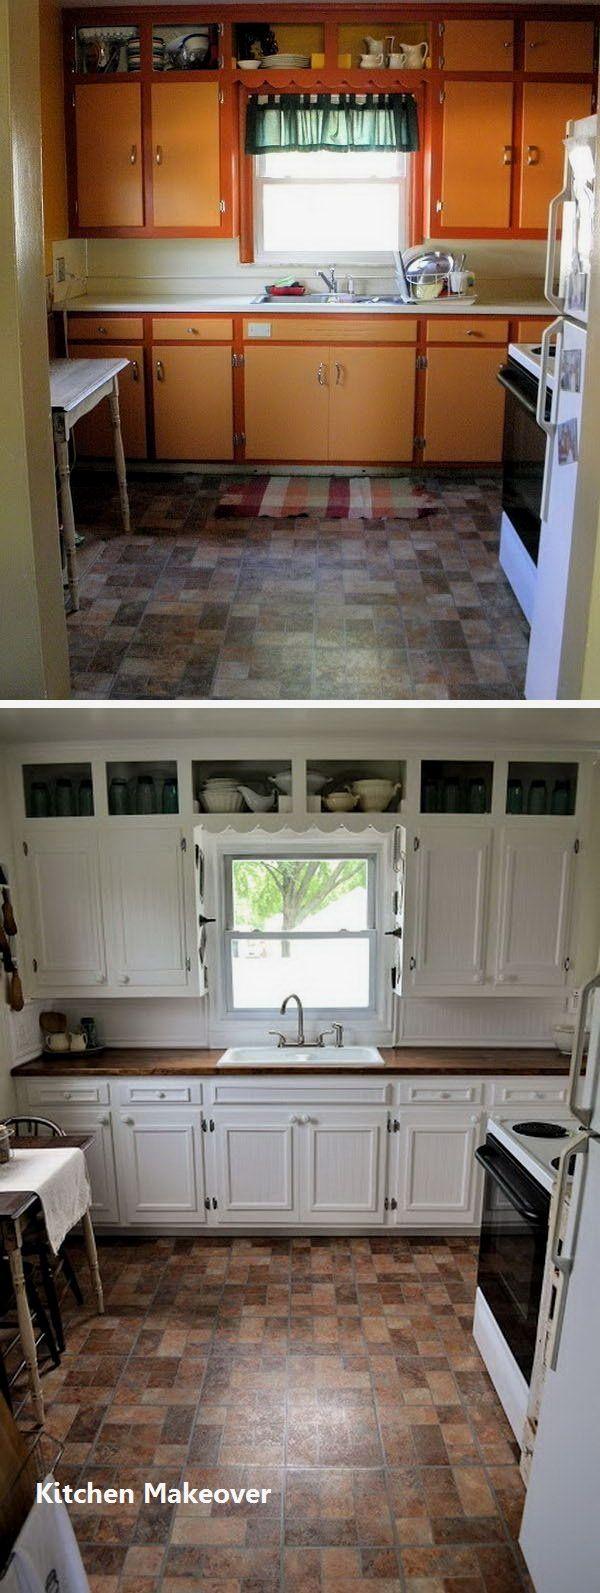 New Kitchen Makeover Ideas   Diy kitchen cabinets makeover ...